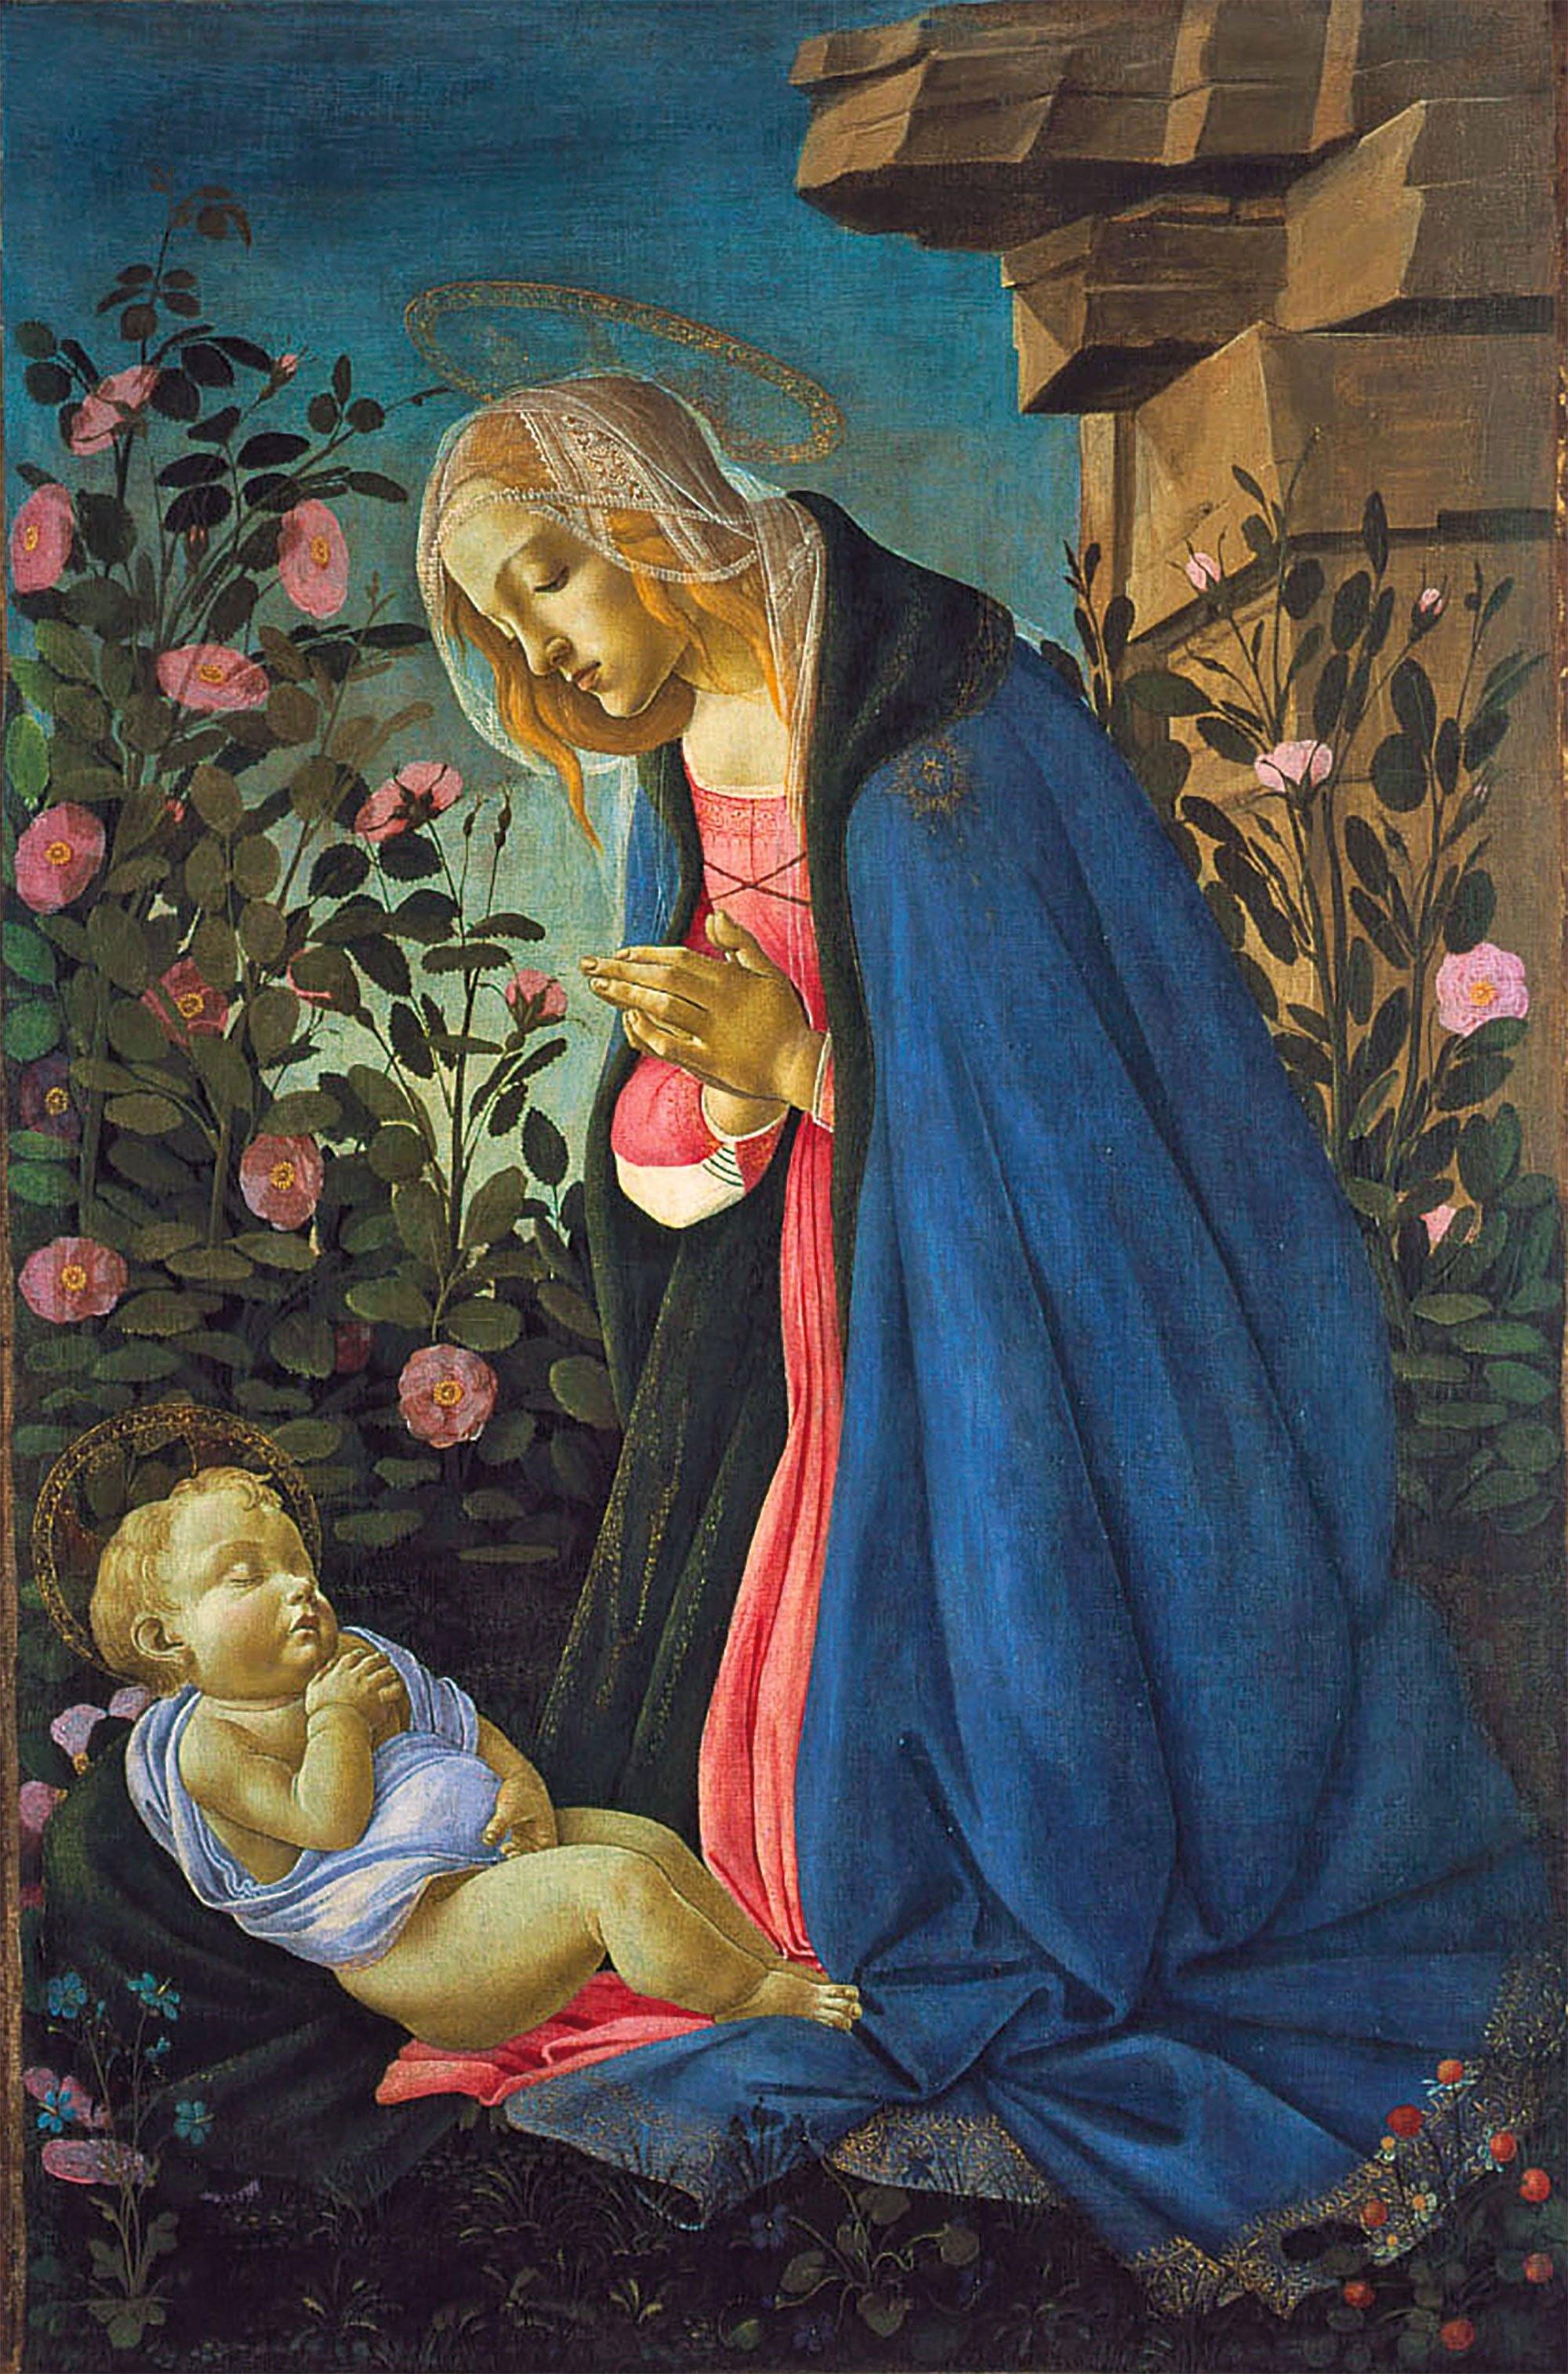 Sandro Botticelli, The Virgin Adoring the Sleeping Christ Child, c. 1485, National Galleries of Scotland, Edinburgh, Scotland, UK